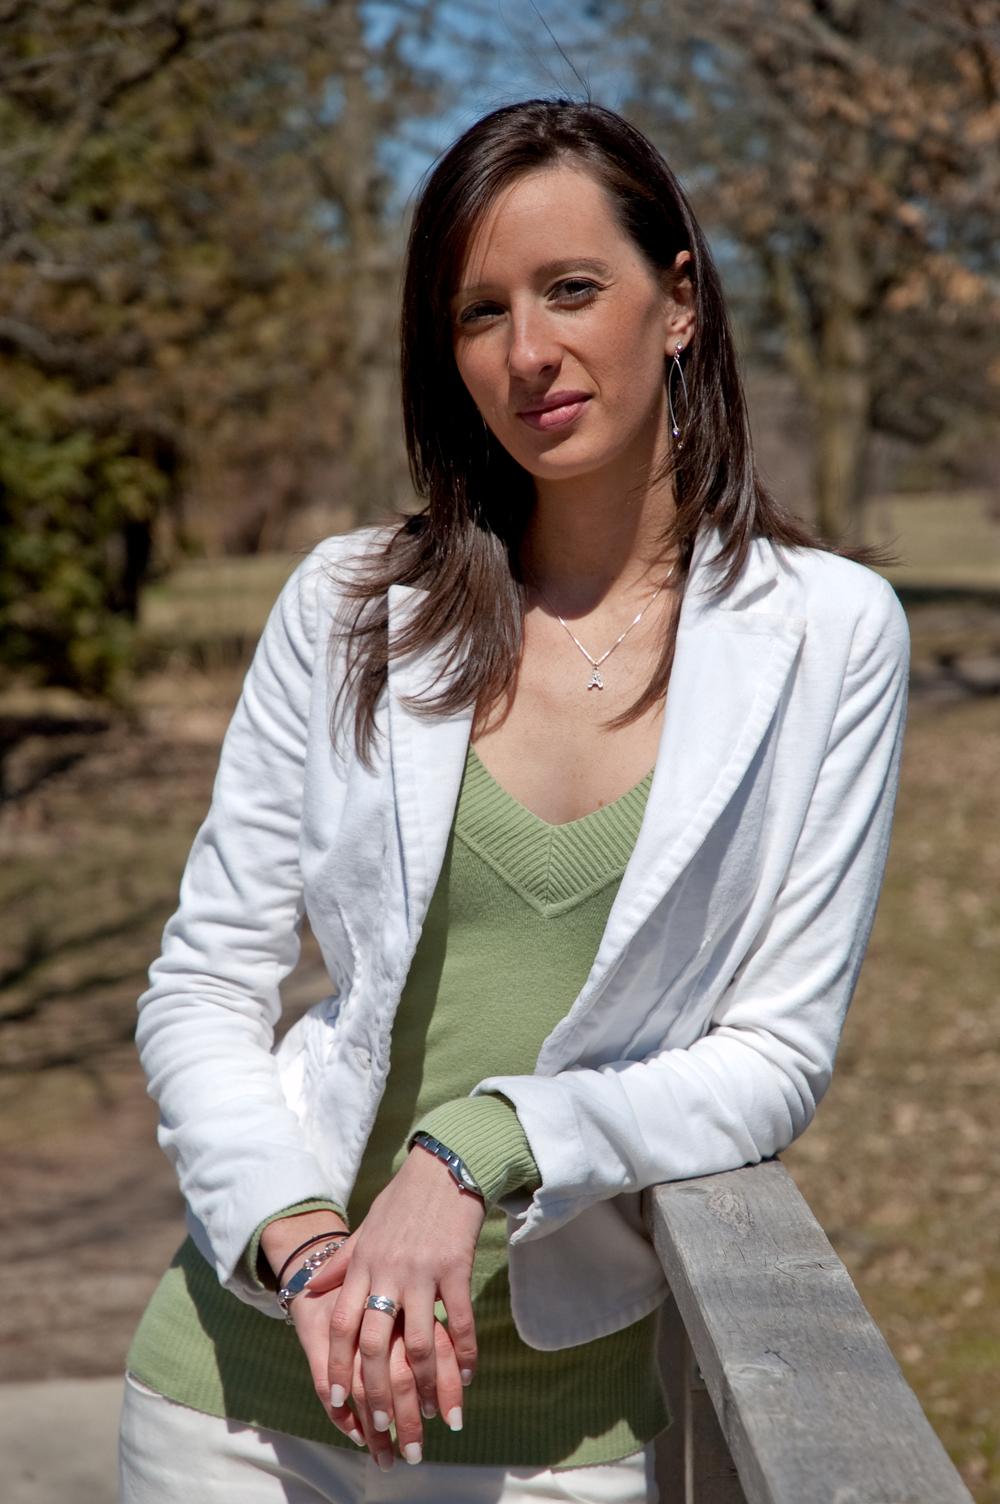 AmandaFerguson_20060408_2340.jpg